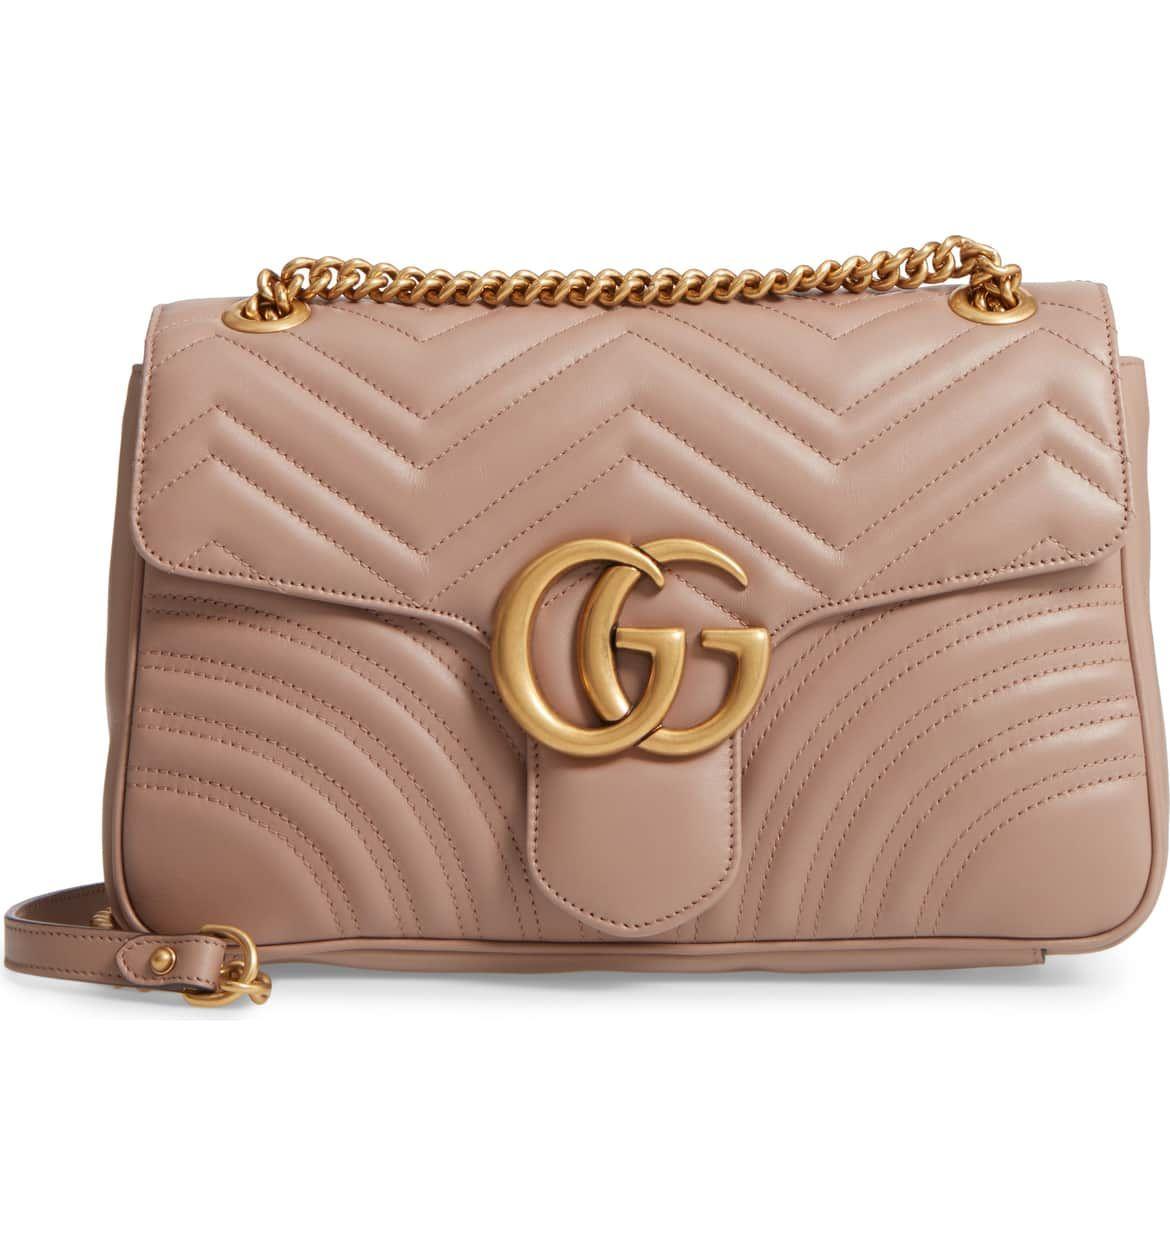 ef56d573f2c Gucci Medium GG Marmont 2.0 Matelassé Leather Shoulder Bag